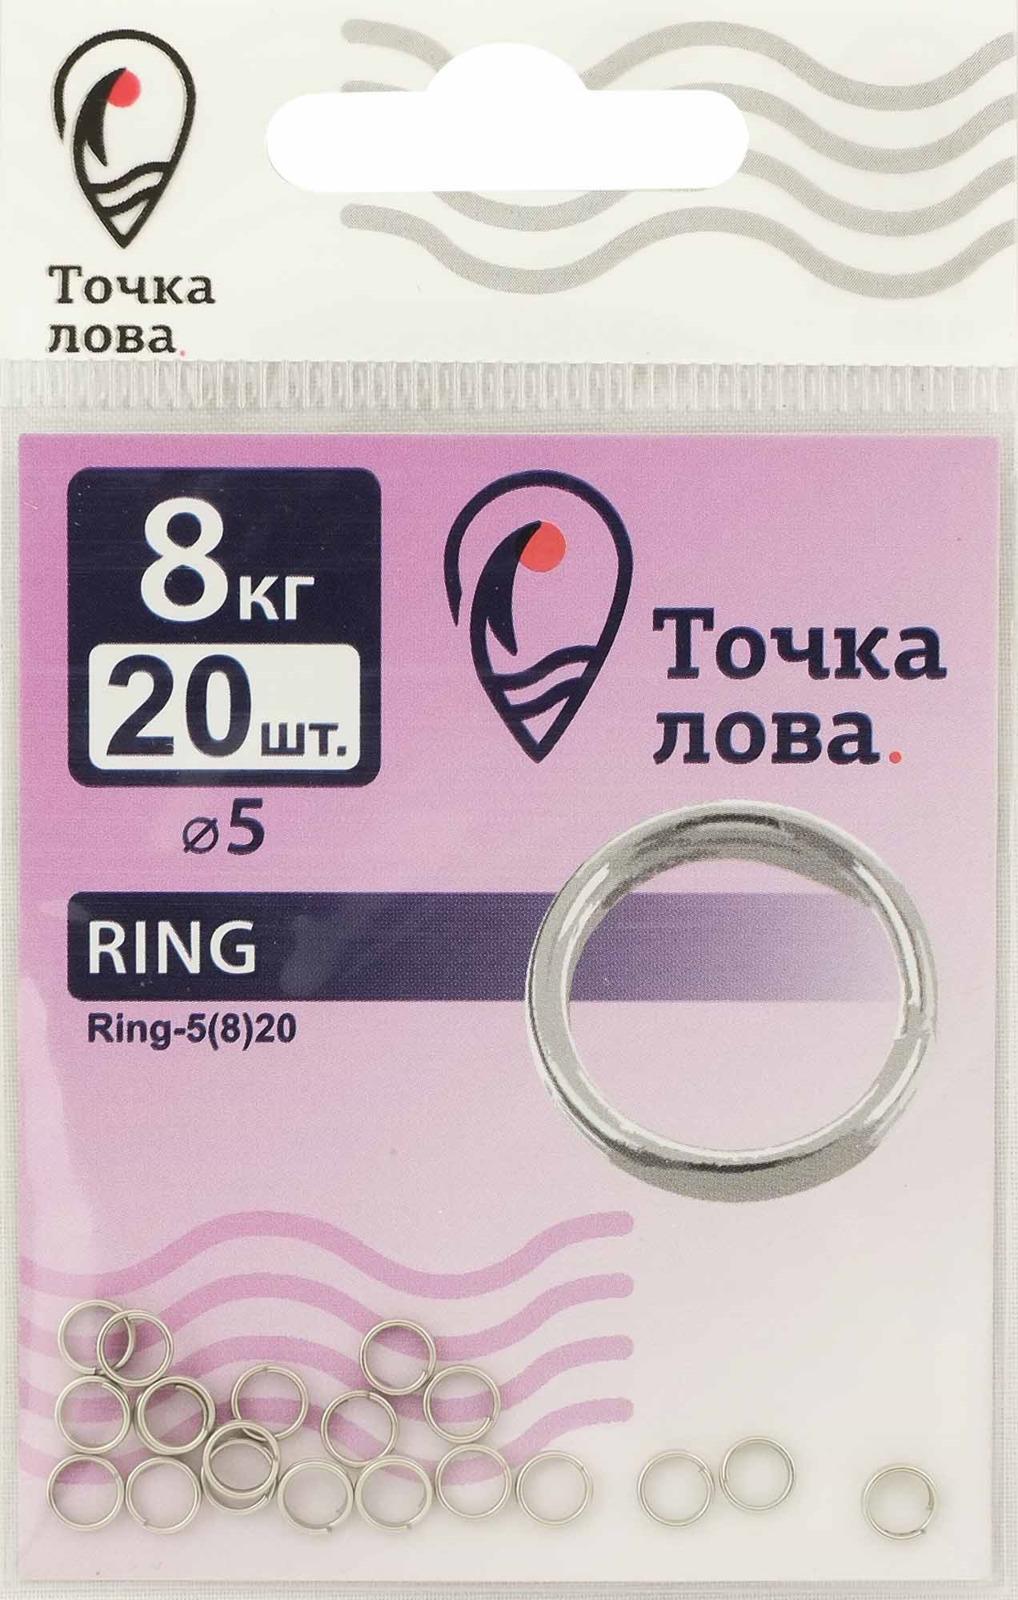 Аксессуар для рыбалки Точка Лова Заводное кольцо, Ring-5(8), 20 шт